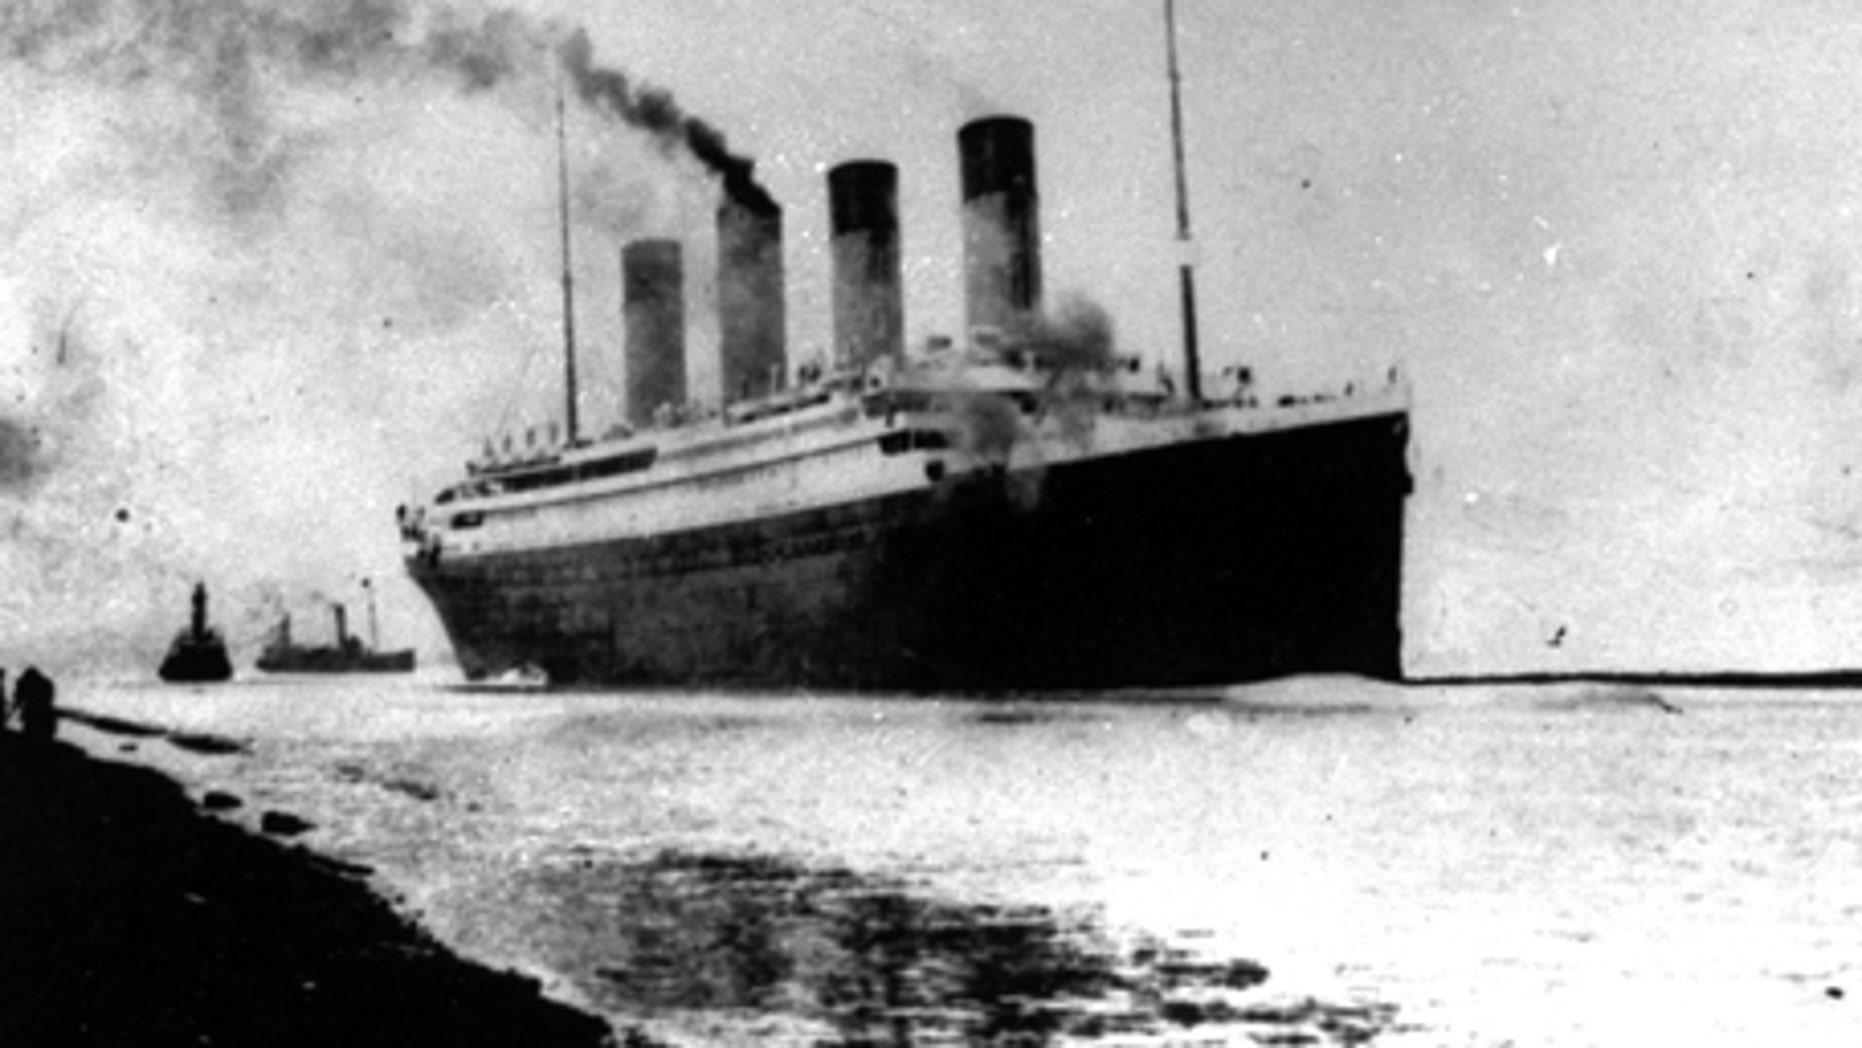 The Titanic departs Southampton, England on April 10, 1912.